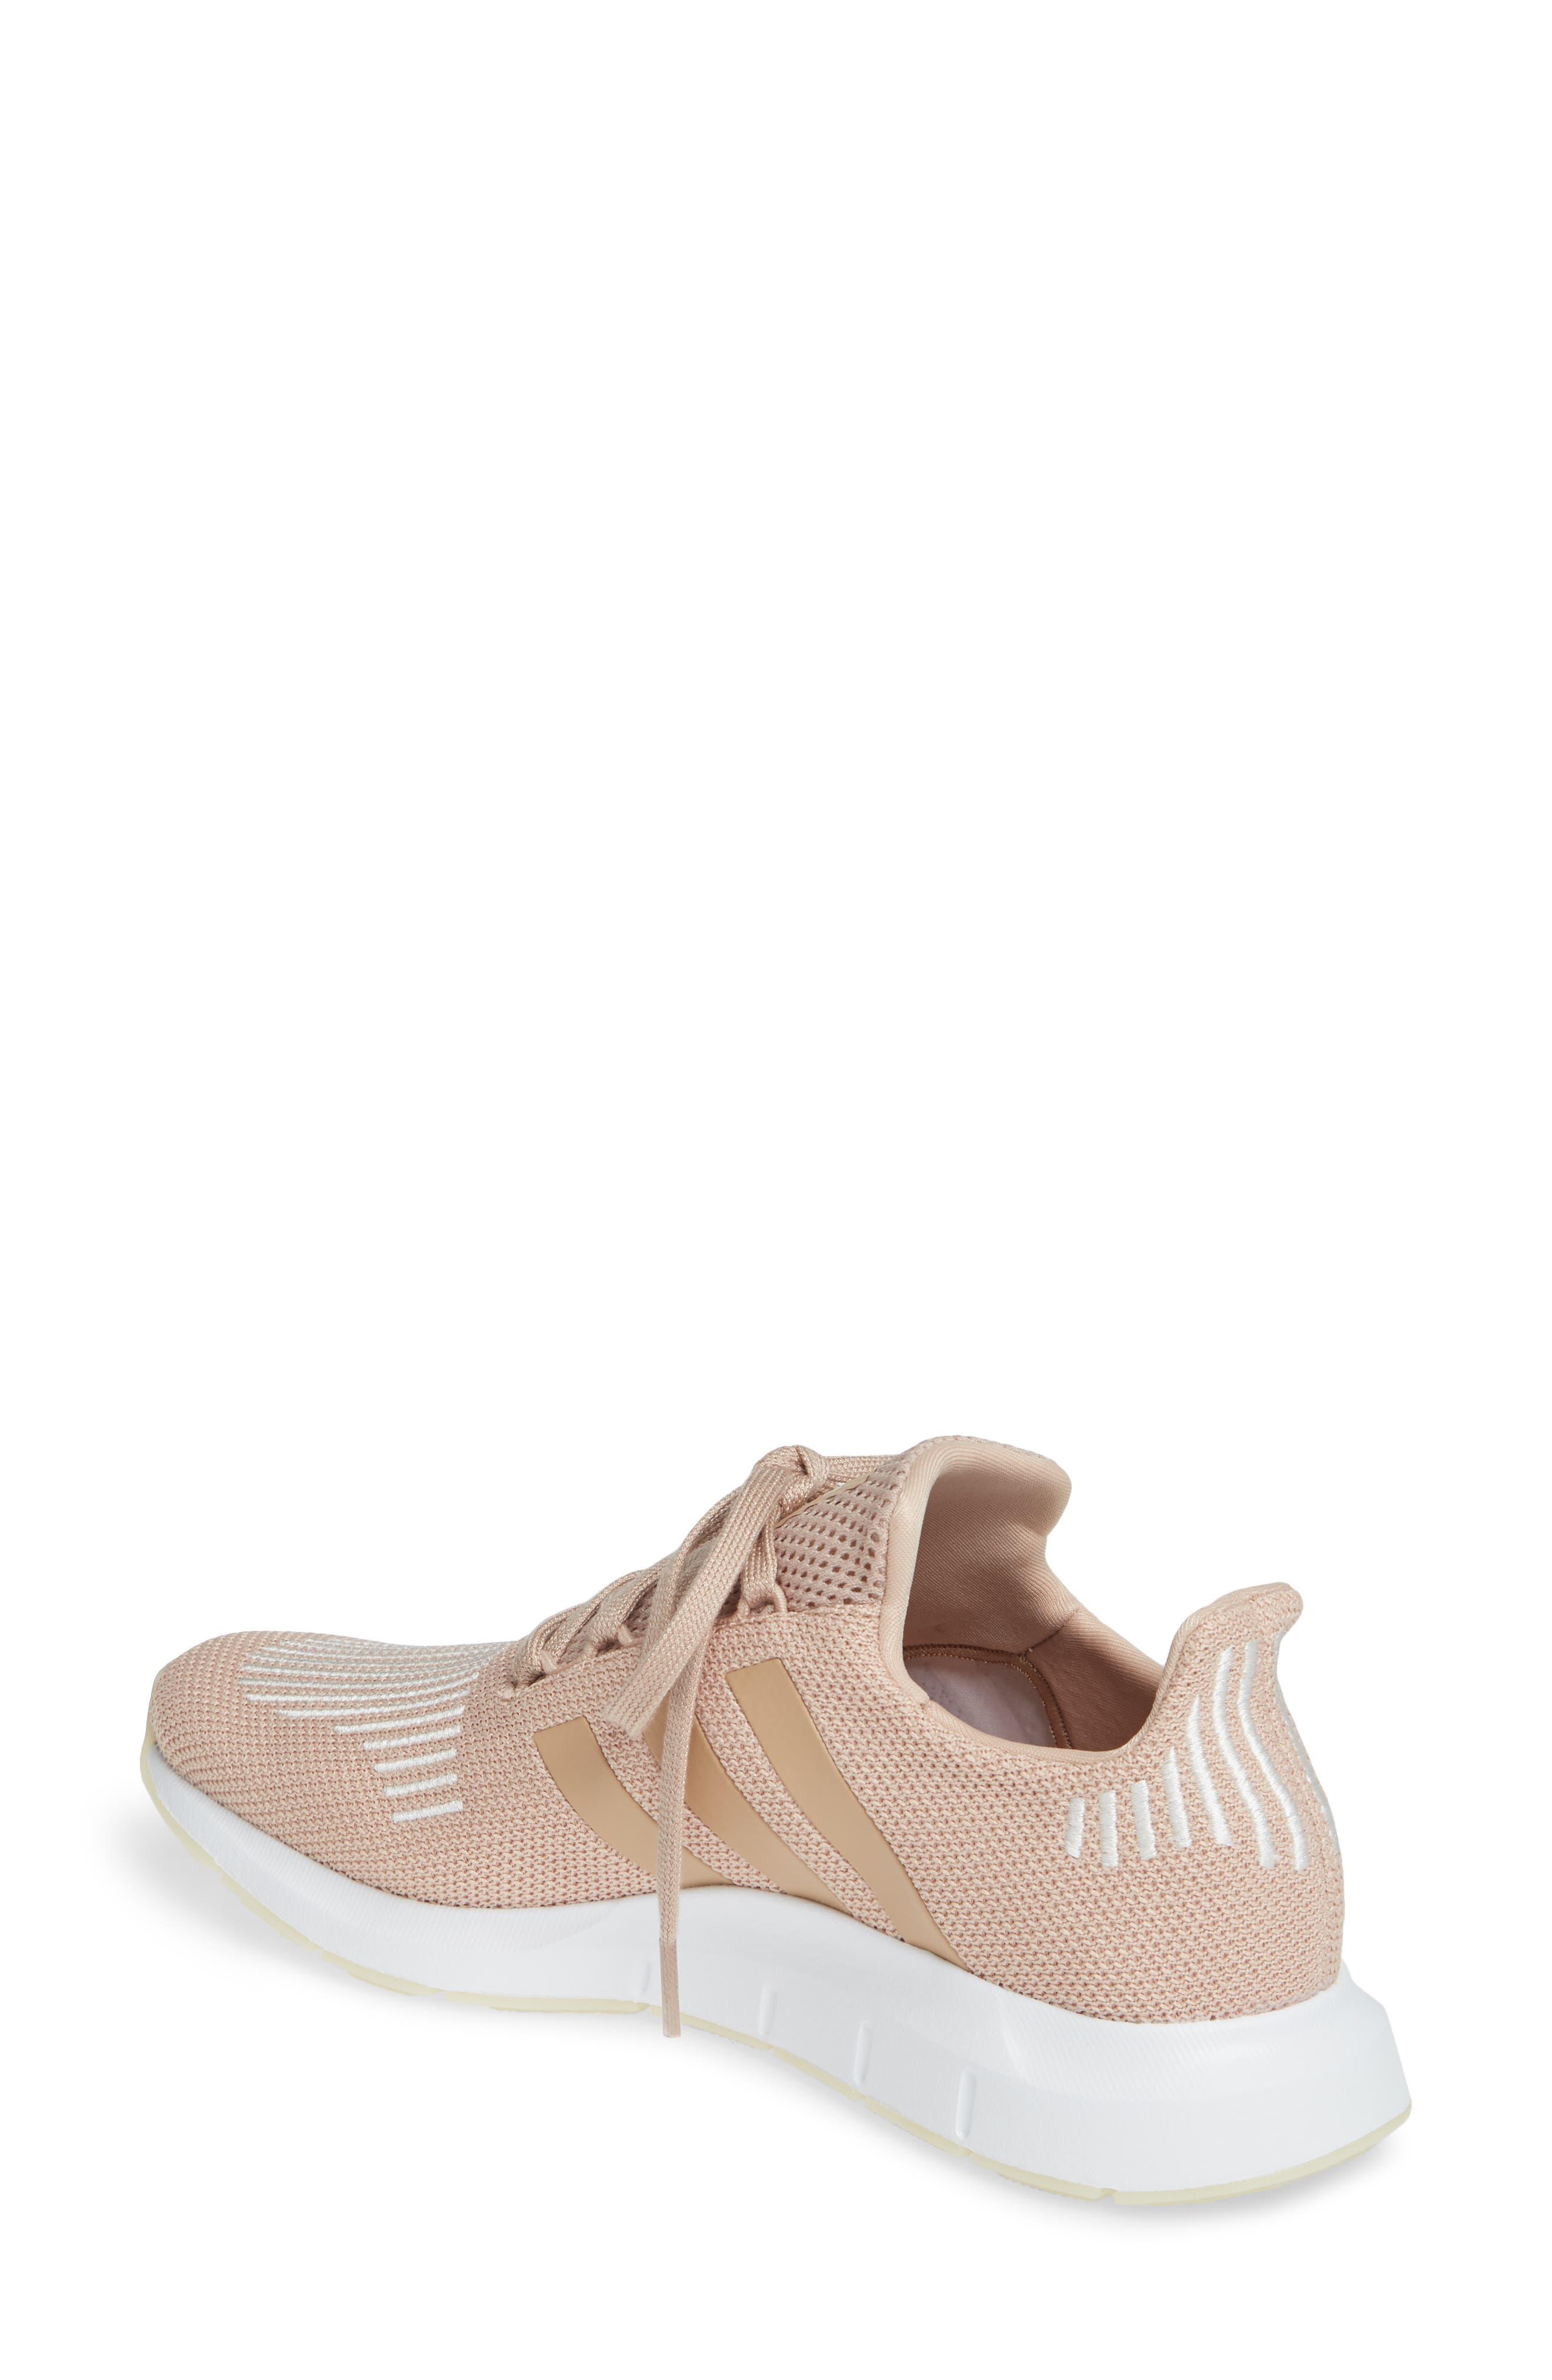 ,                             Swift Run Sneaker,                             Alternate thumbnail 2, color,                             ASH PEARL/ OFF WHITE/ WHITE